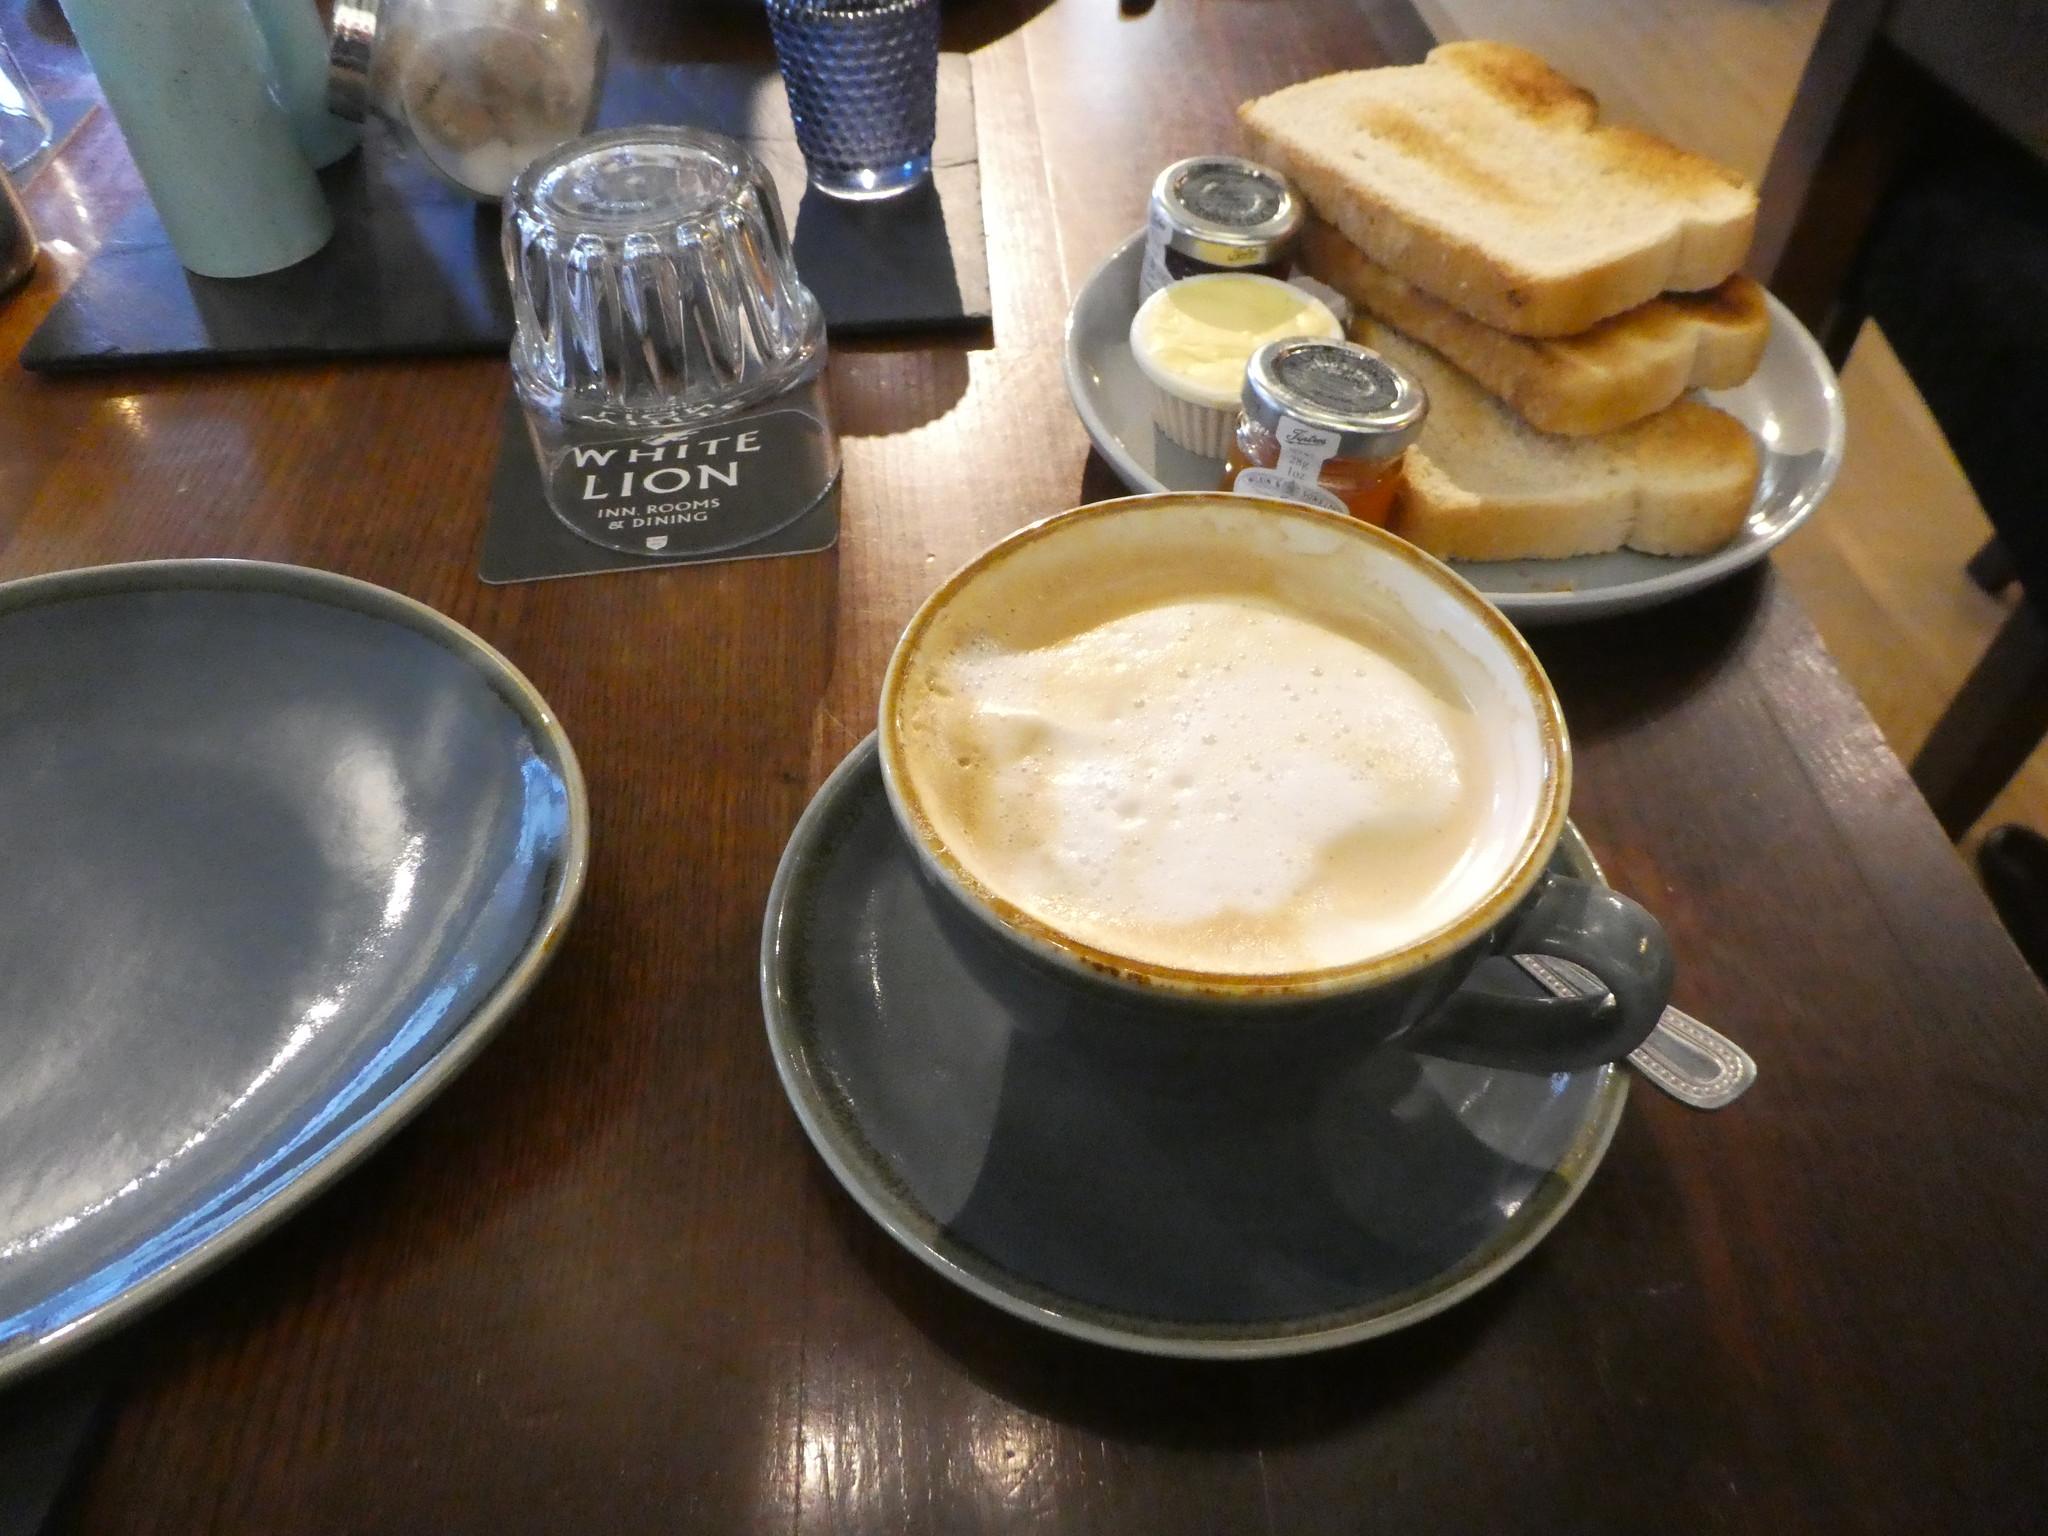 Breakfast at the White Lion Hotel, Hebden Bridge